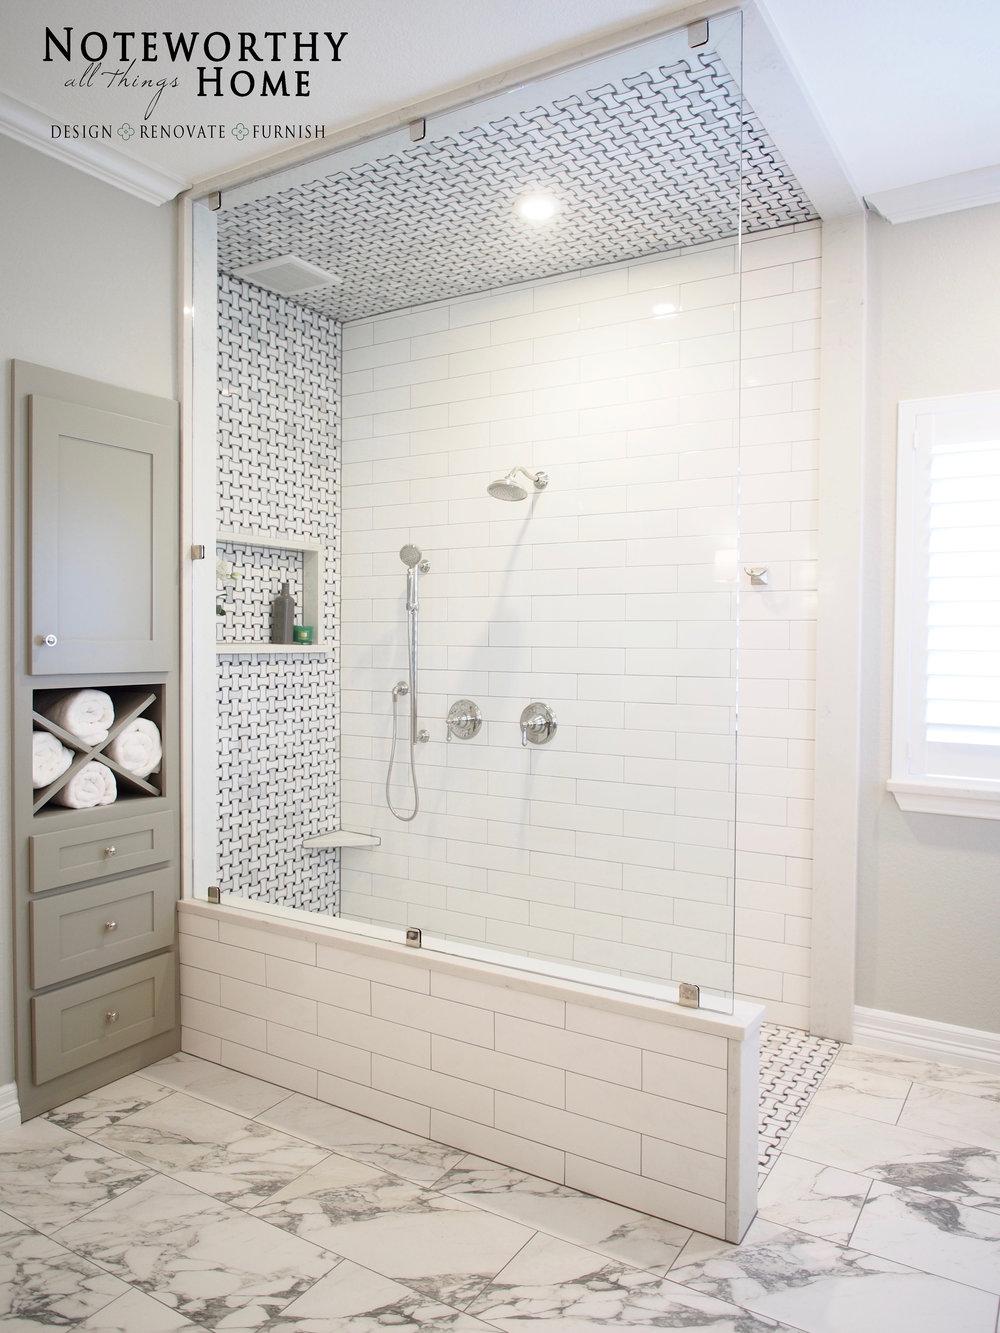 Szablak Shower.jpg